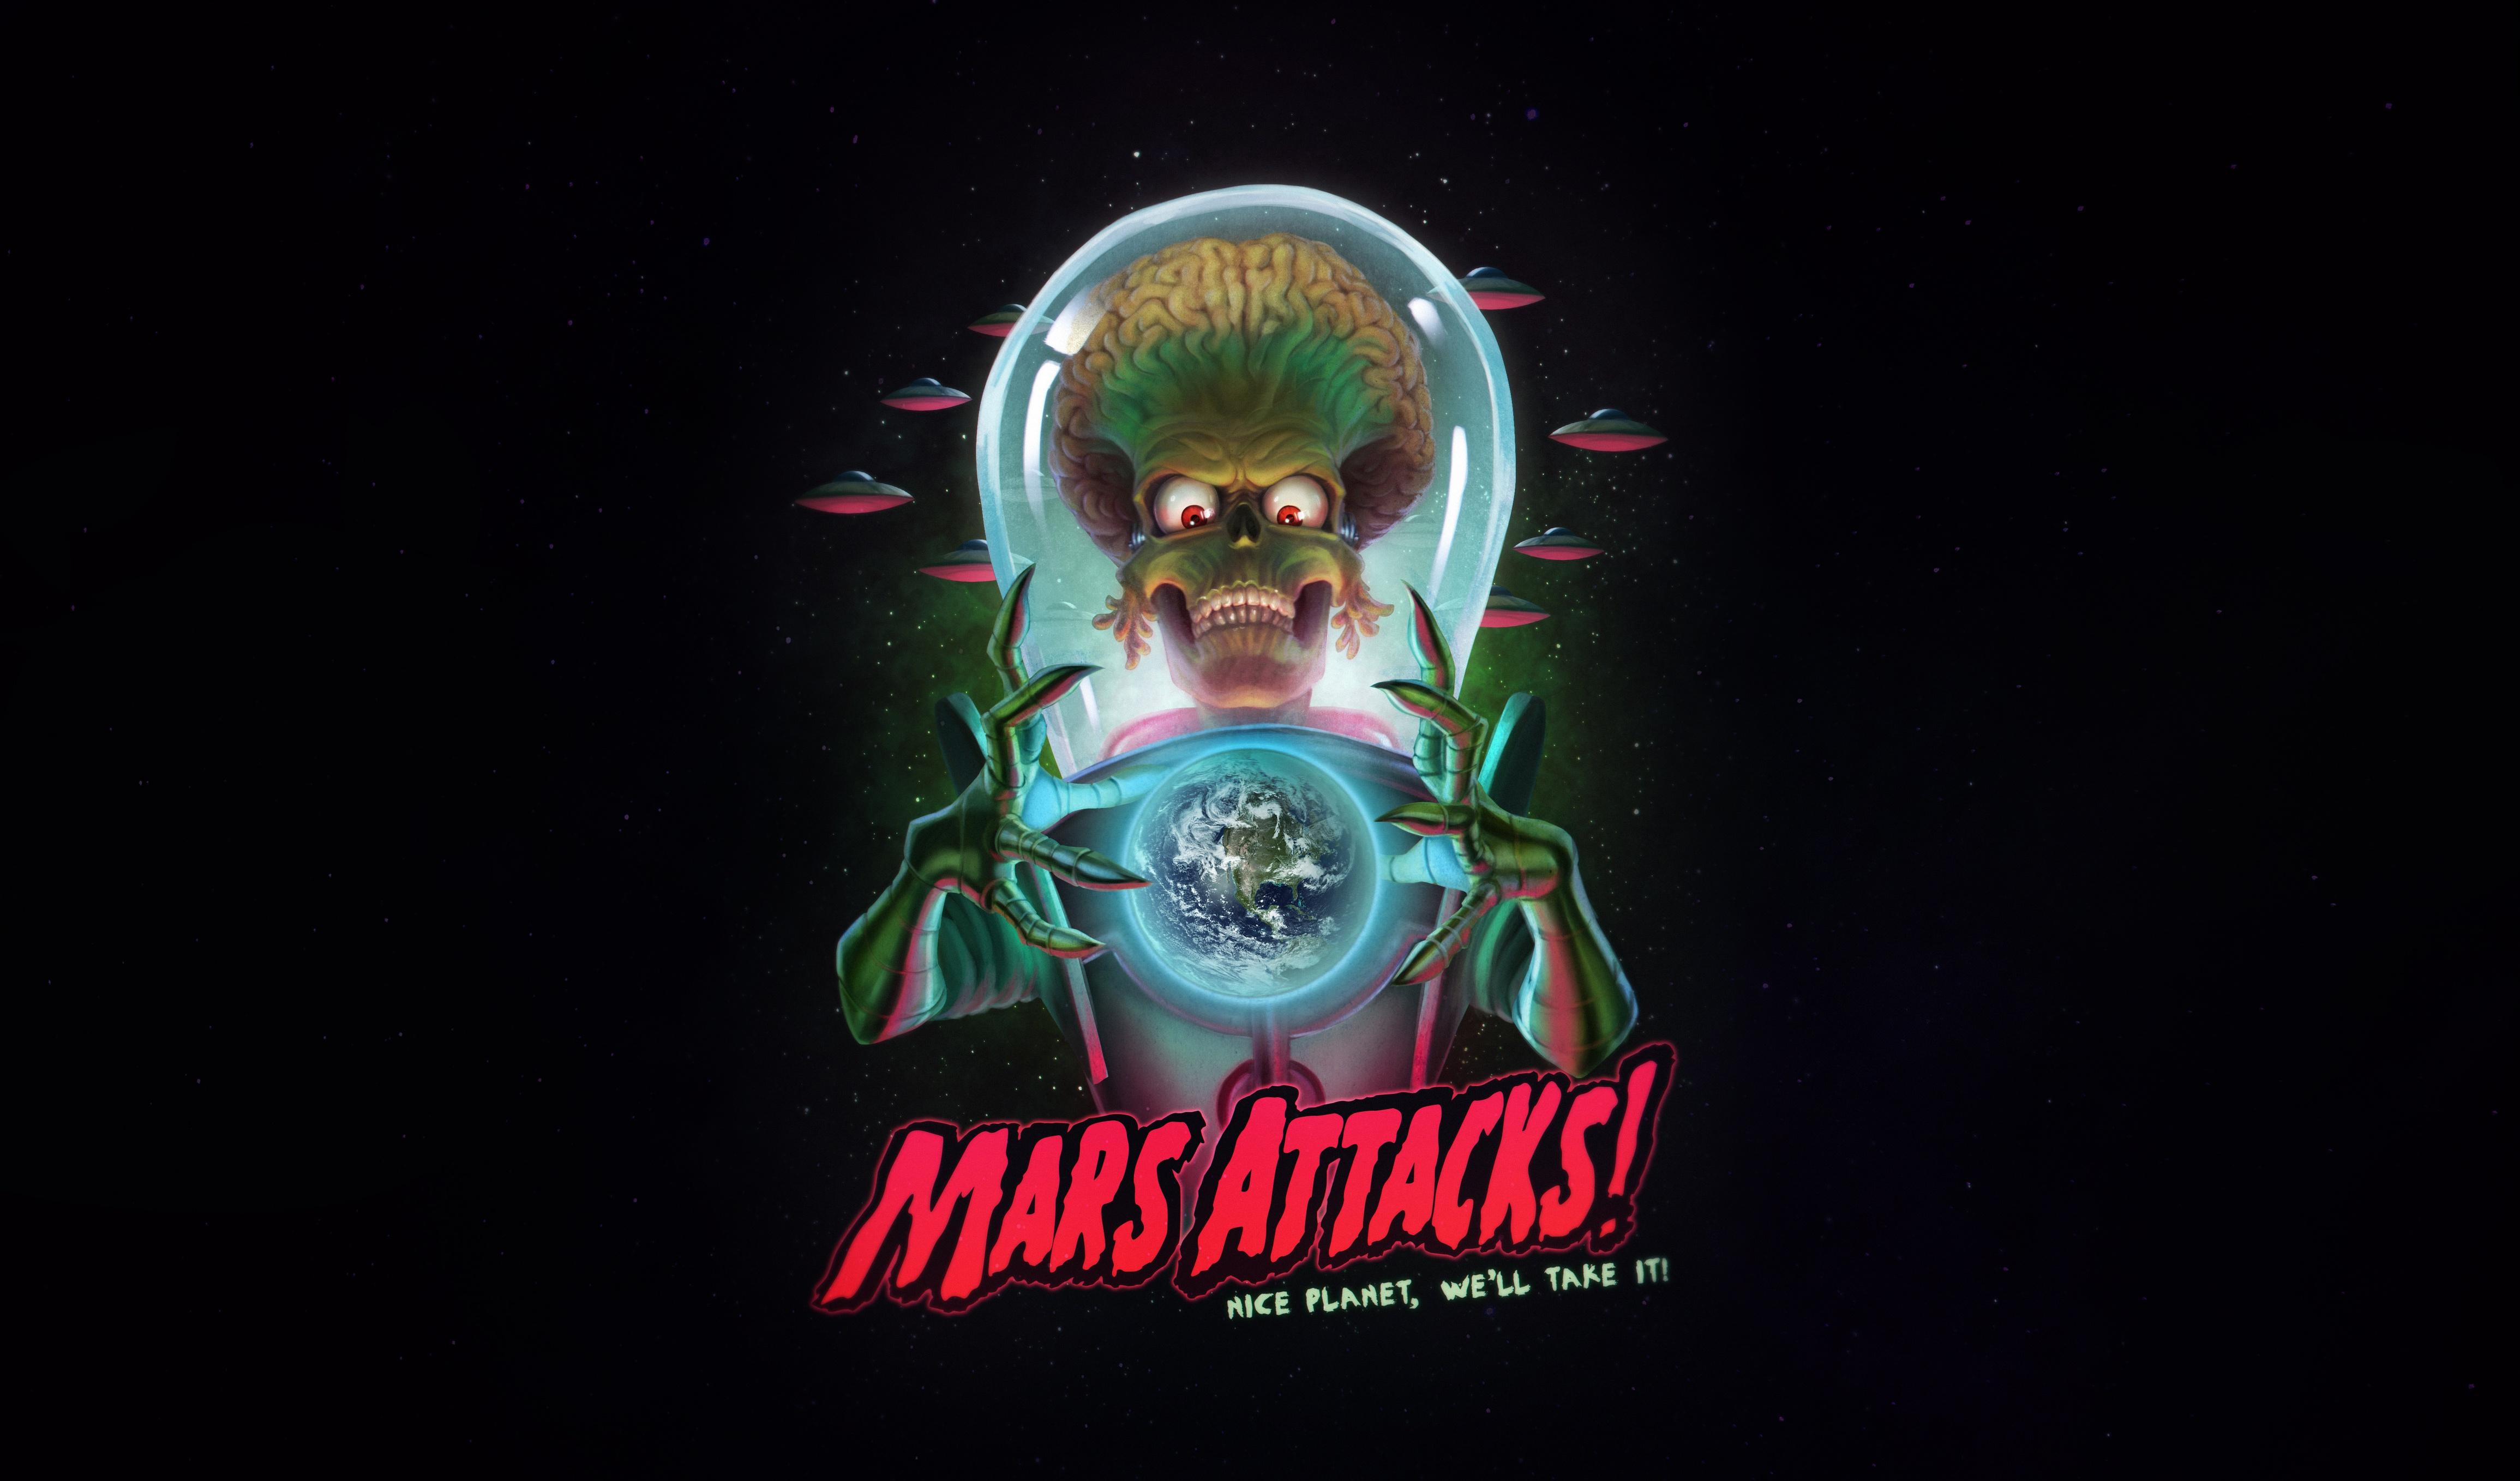 Wallpaper Movies Mars Attacks Humor Science Fiction